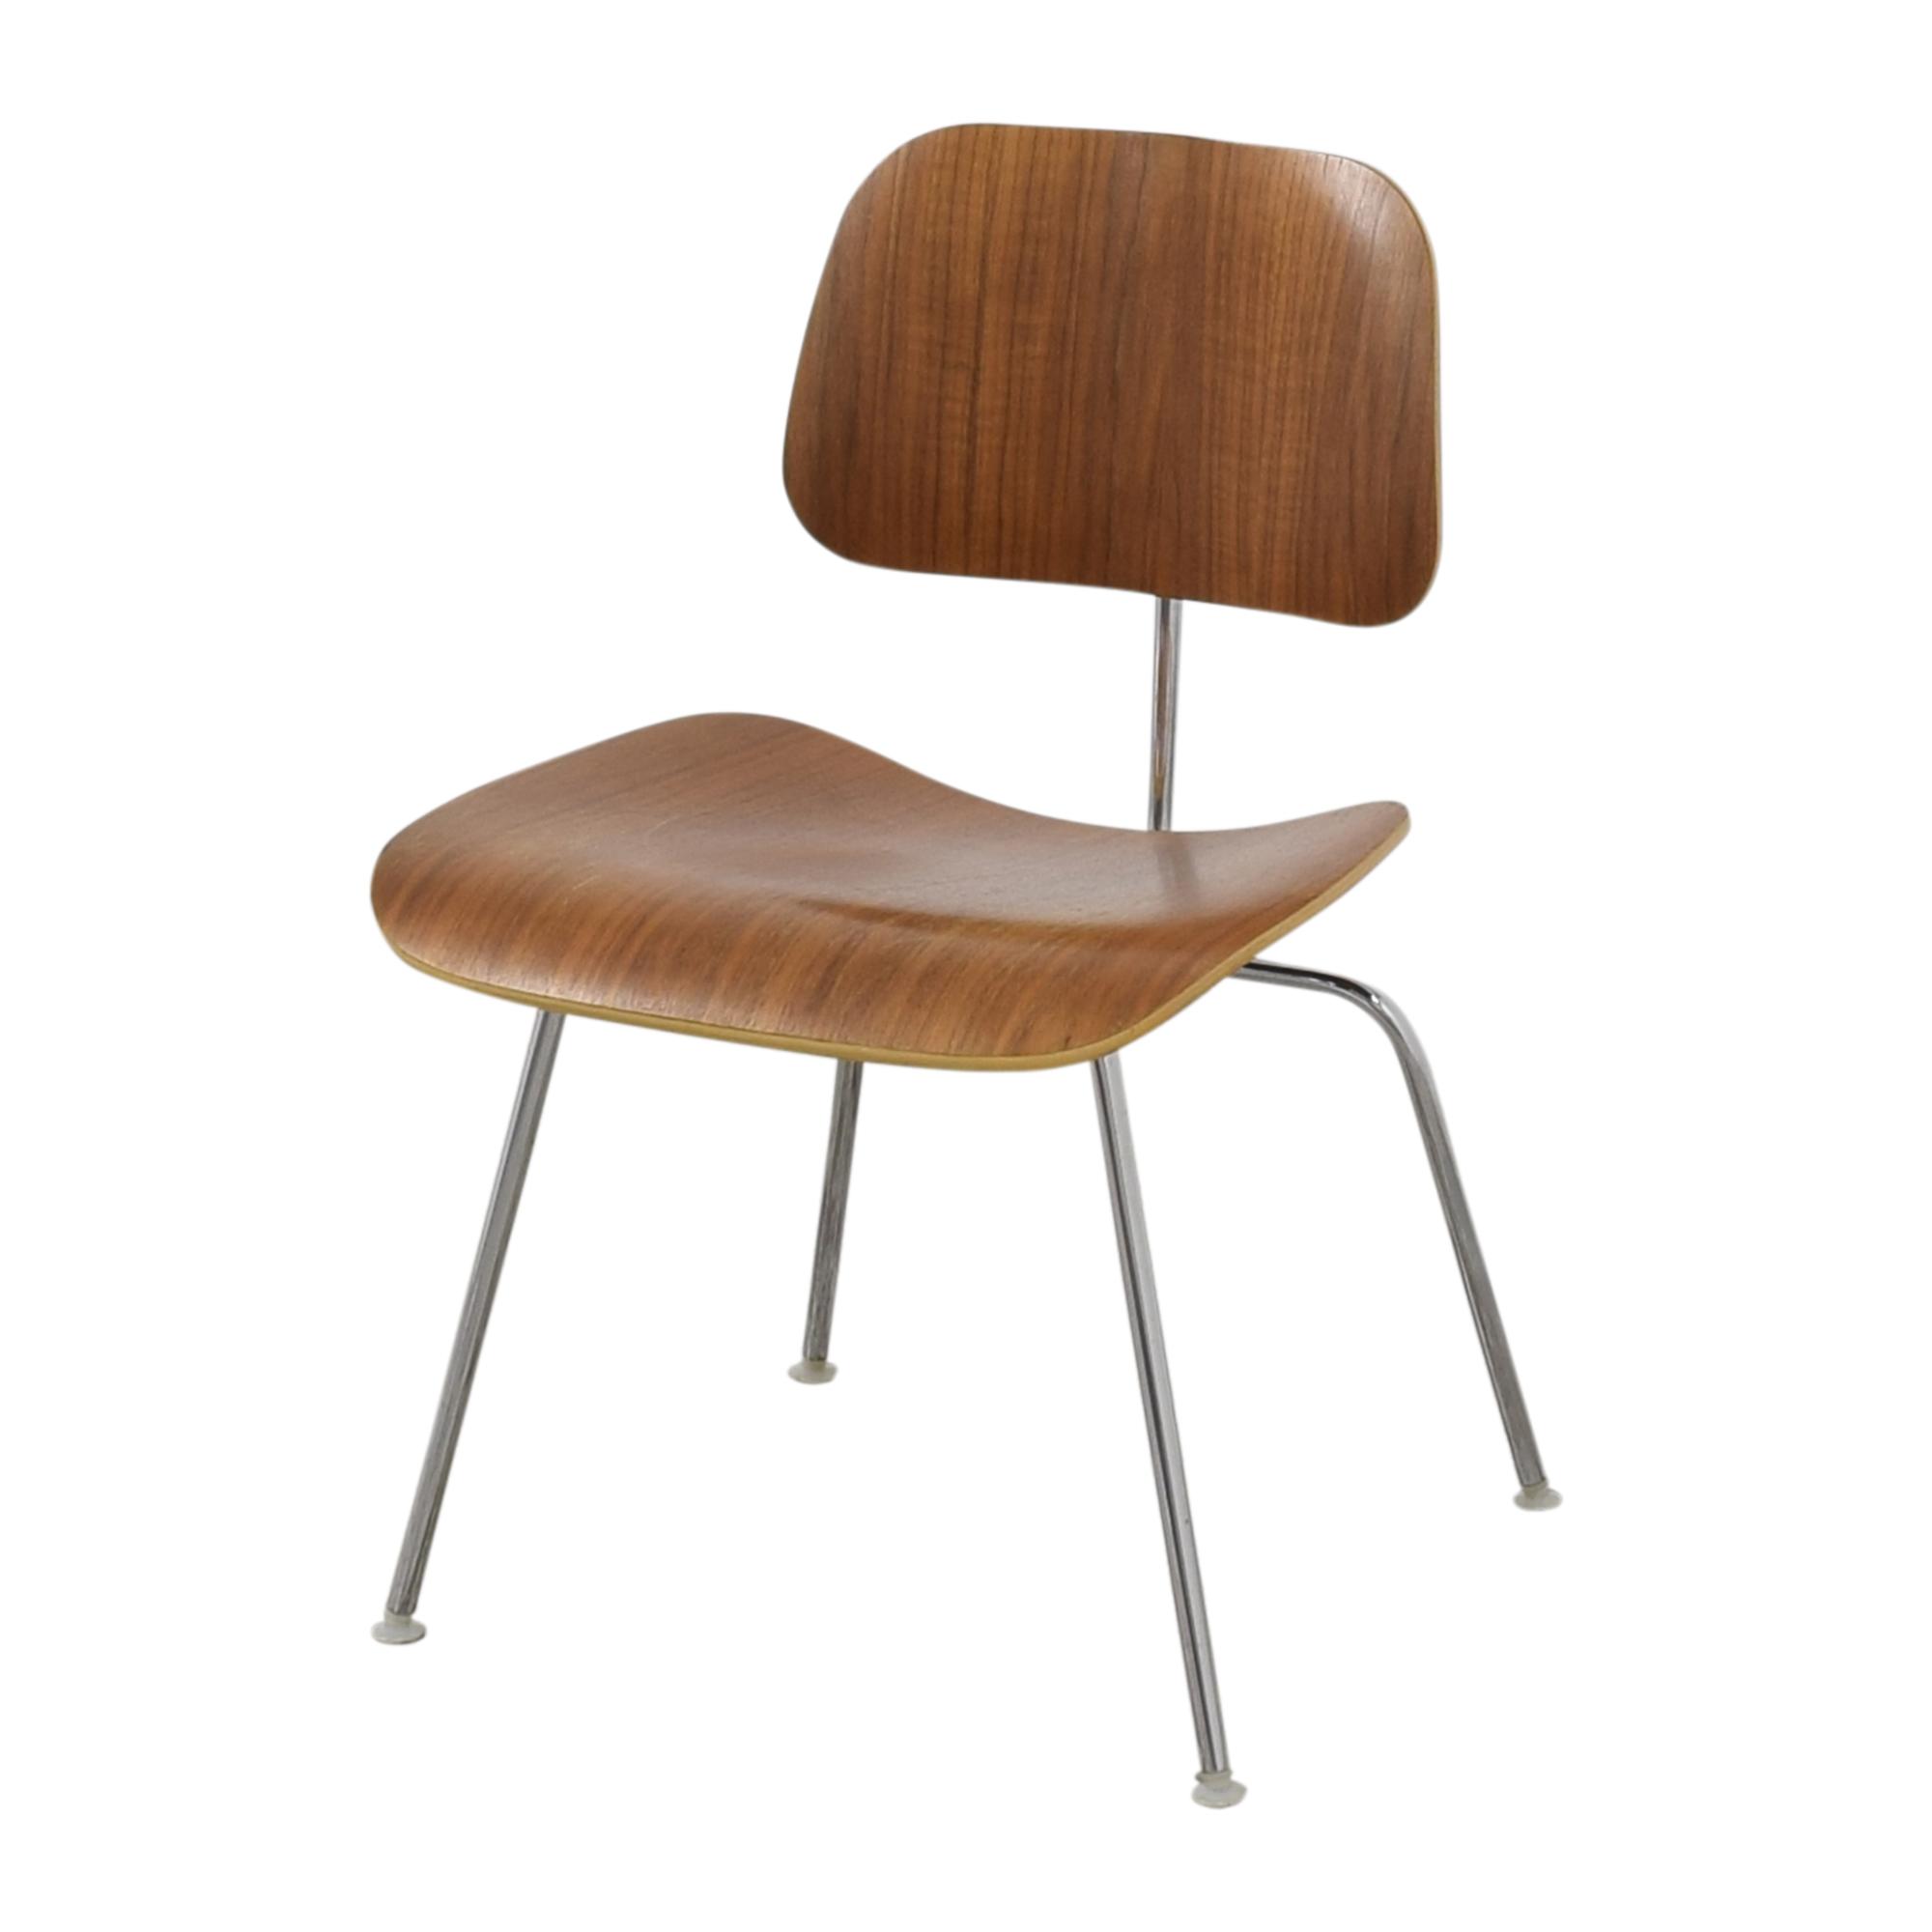 Herman Miller Herman Miller Eames Molded Dining Chair for sale